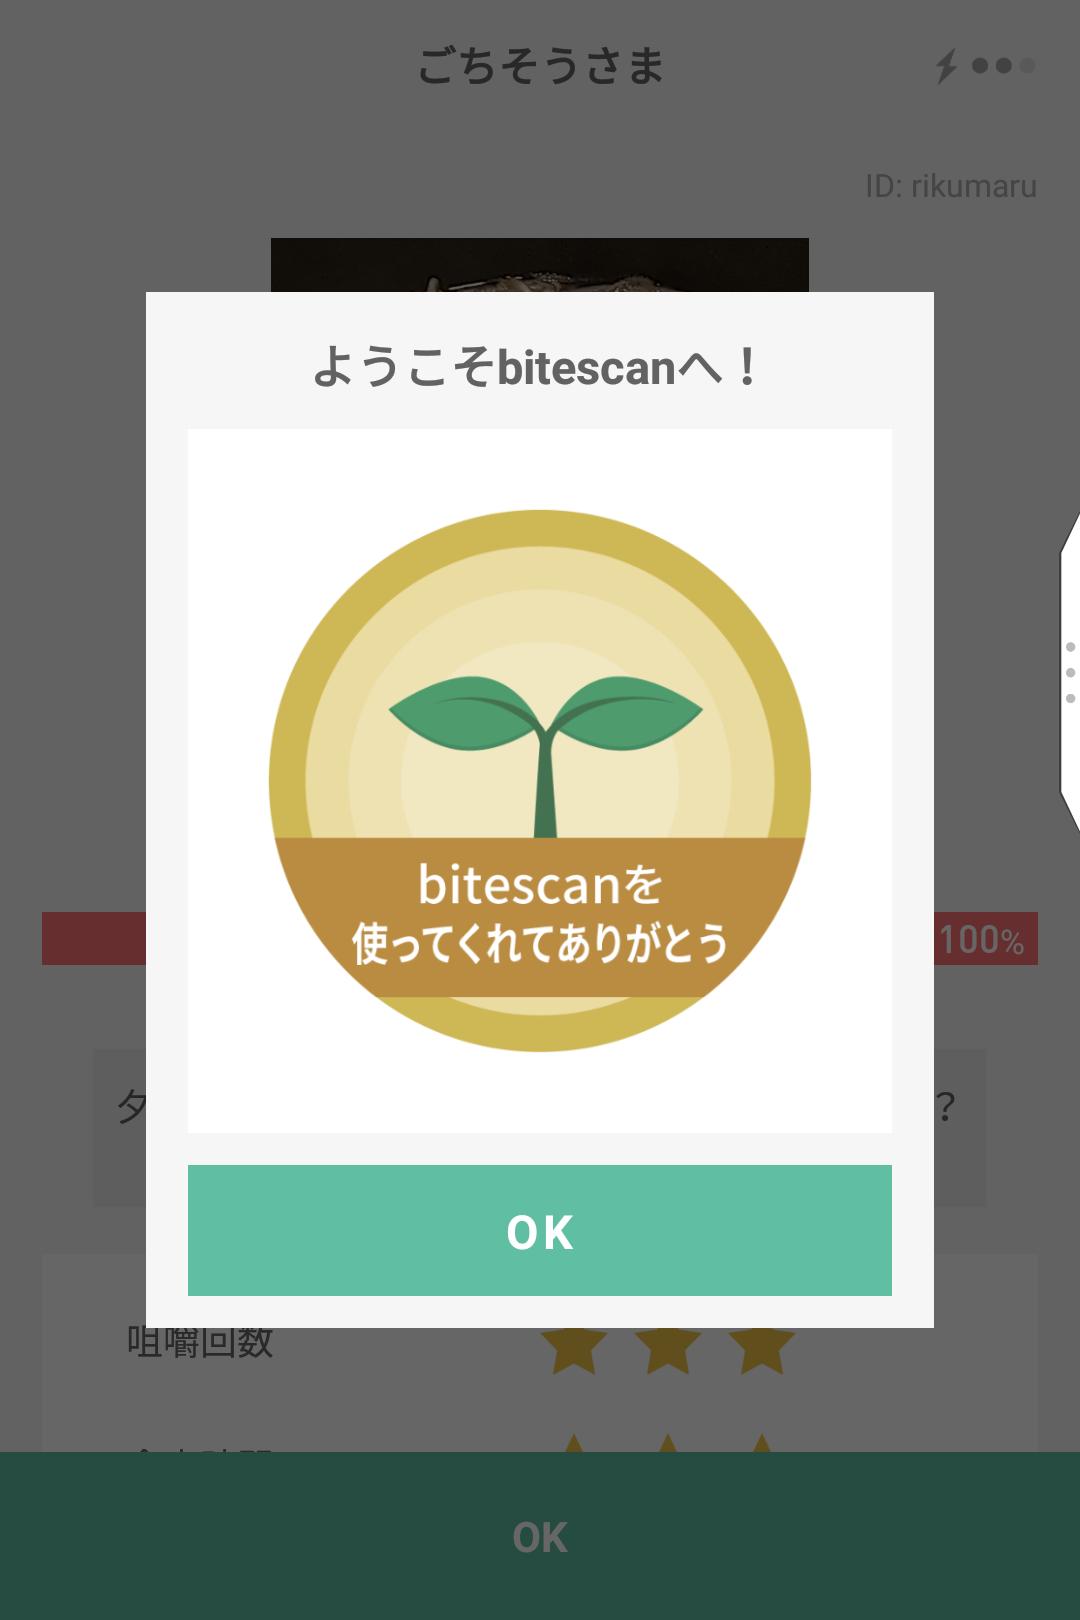 bitescanのバッジ制度